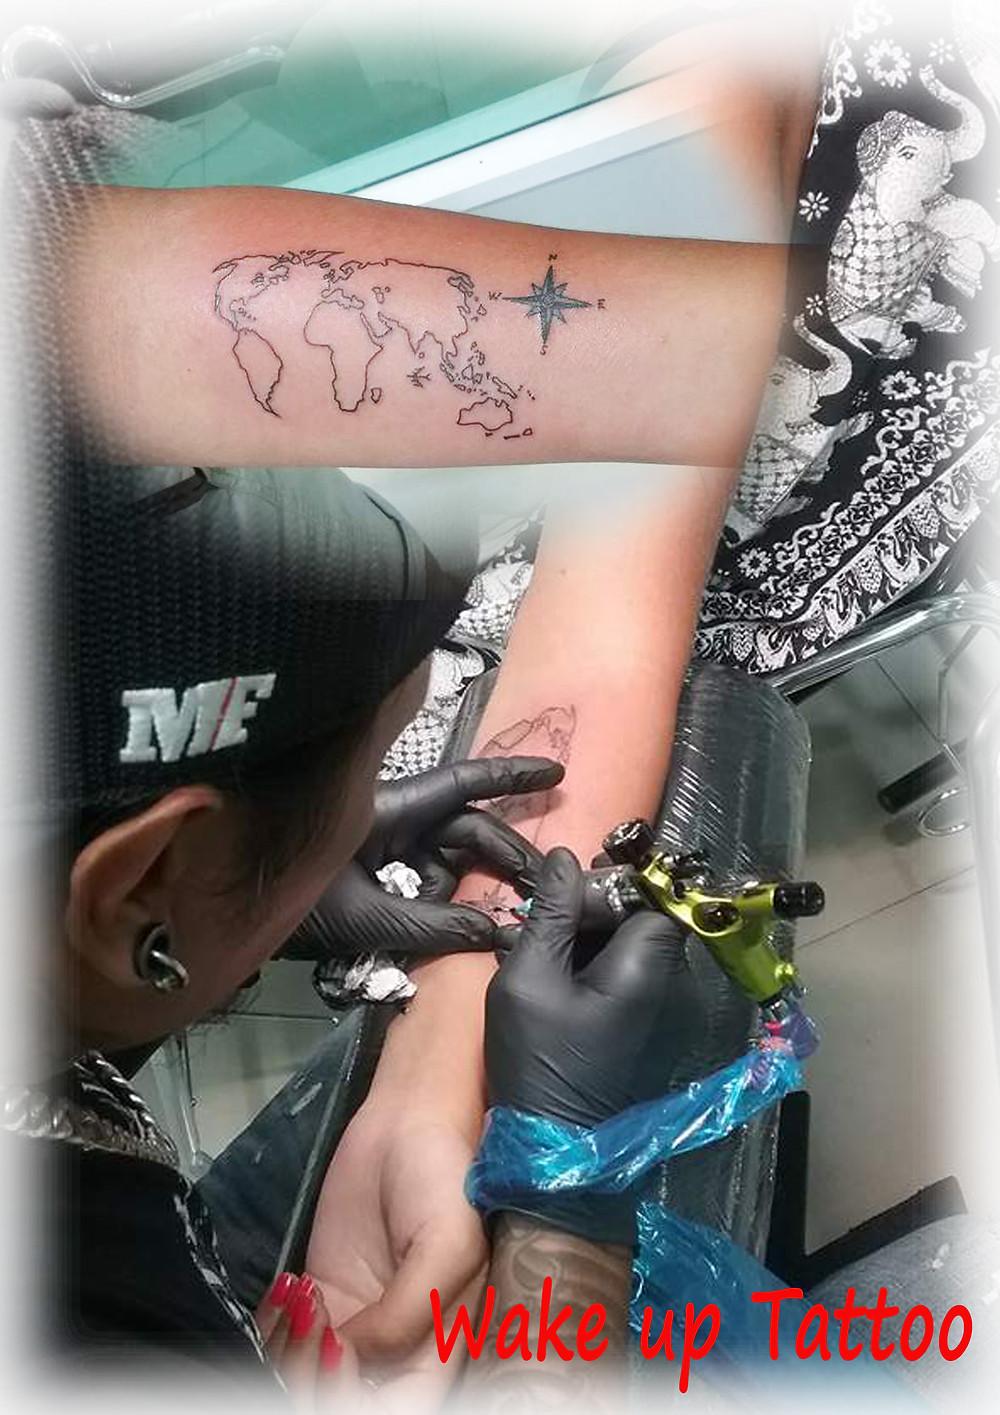 Map Tattoo by Wake up Tattoo Phuket